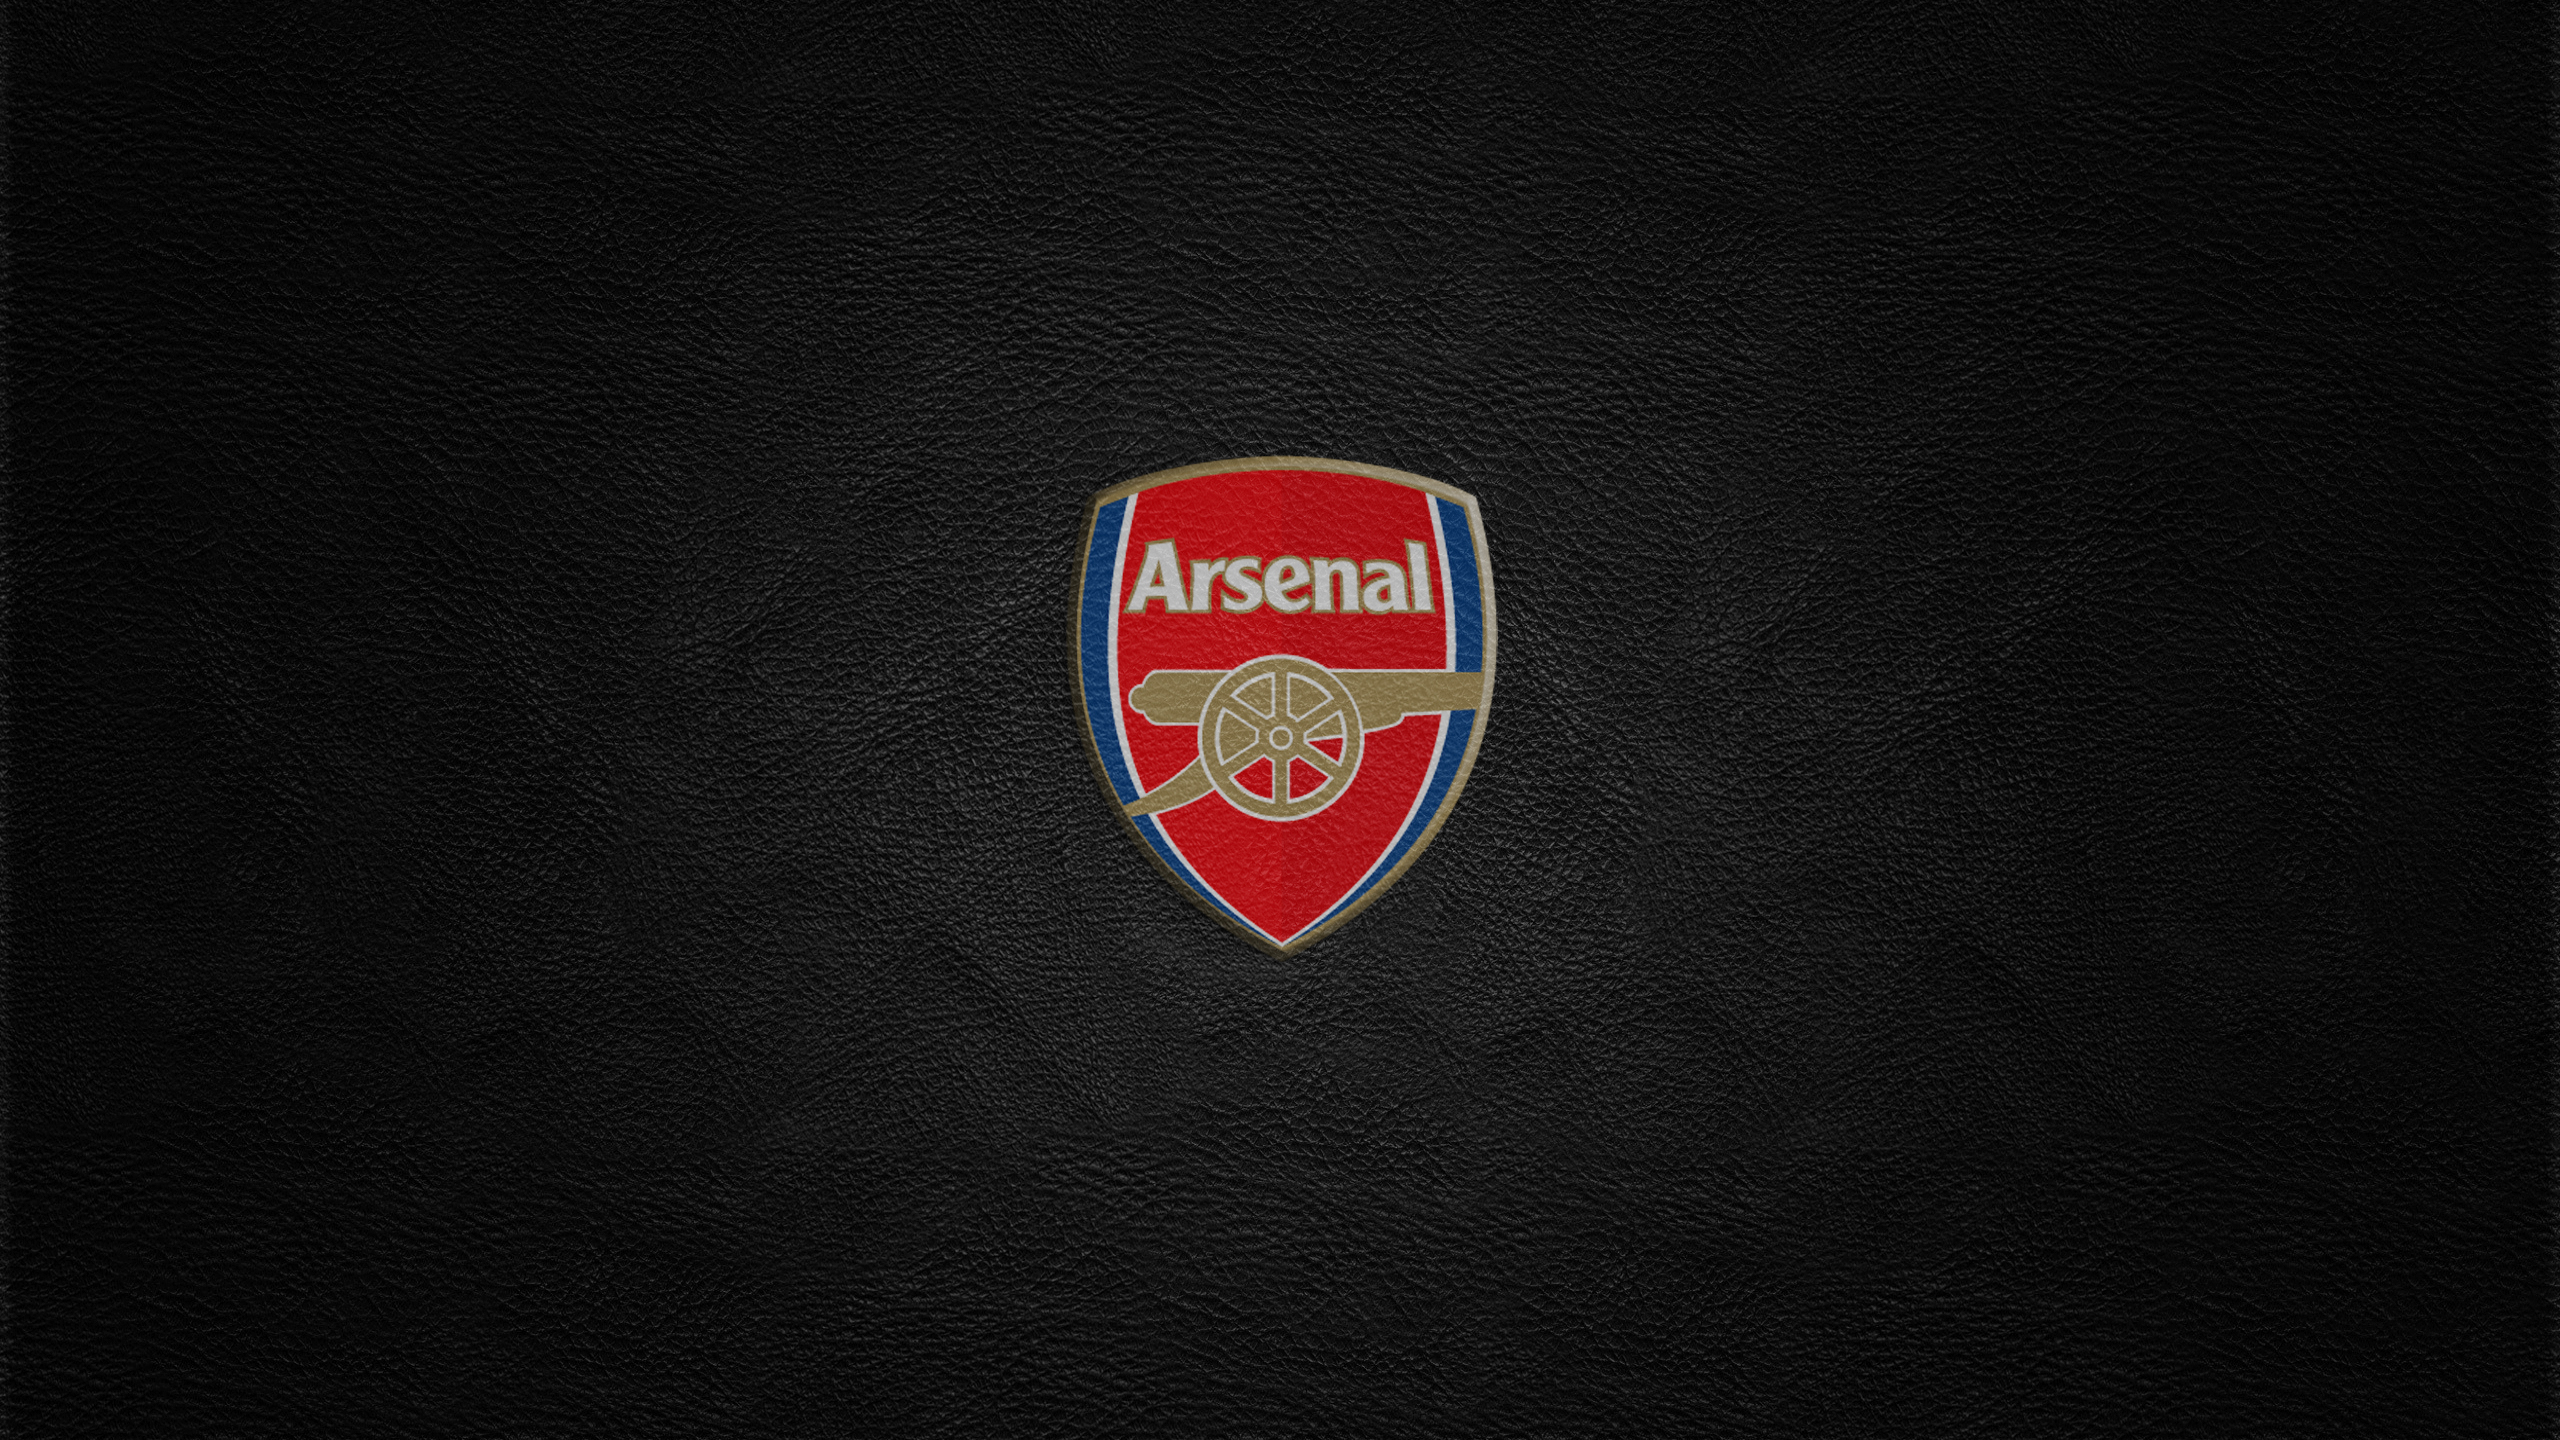 Mesut Ozil Wallpapers Hd Arsenal Arsenal Wallpapers Hd Free Download Pixelstalk Net